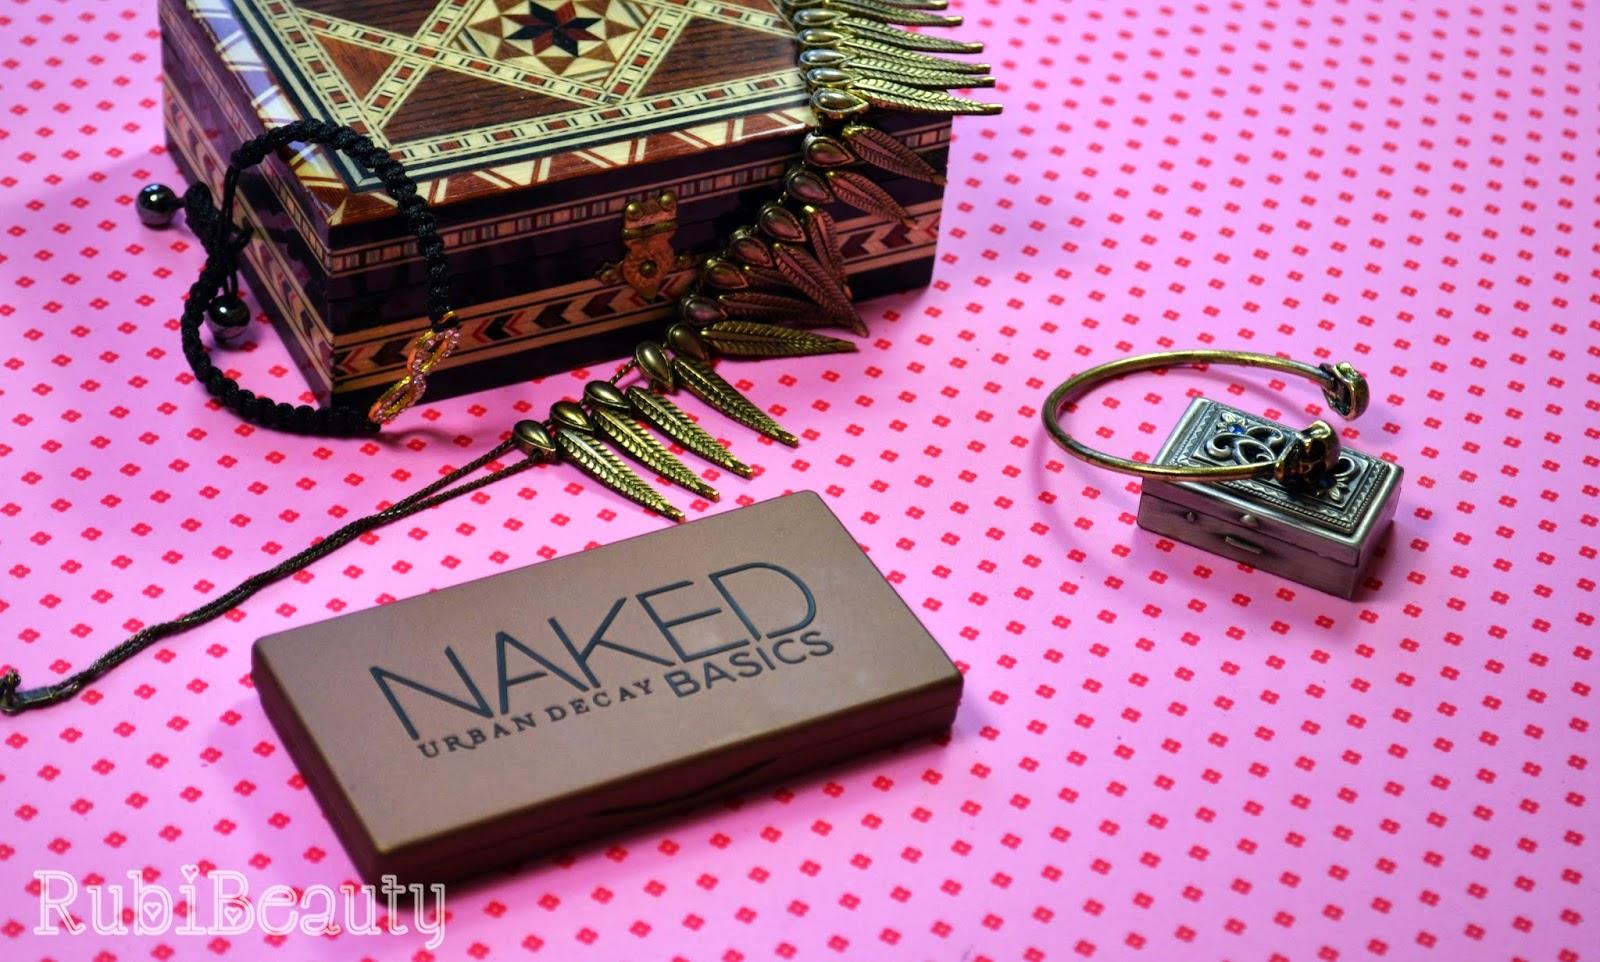 rubibeauty review paleta naked basics urban decay clon buyincoins